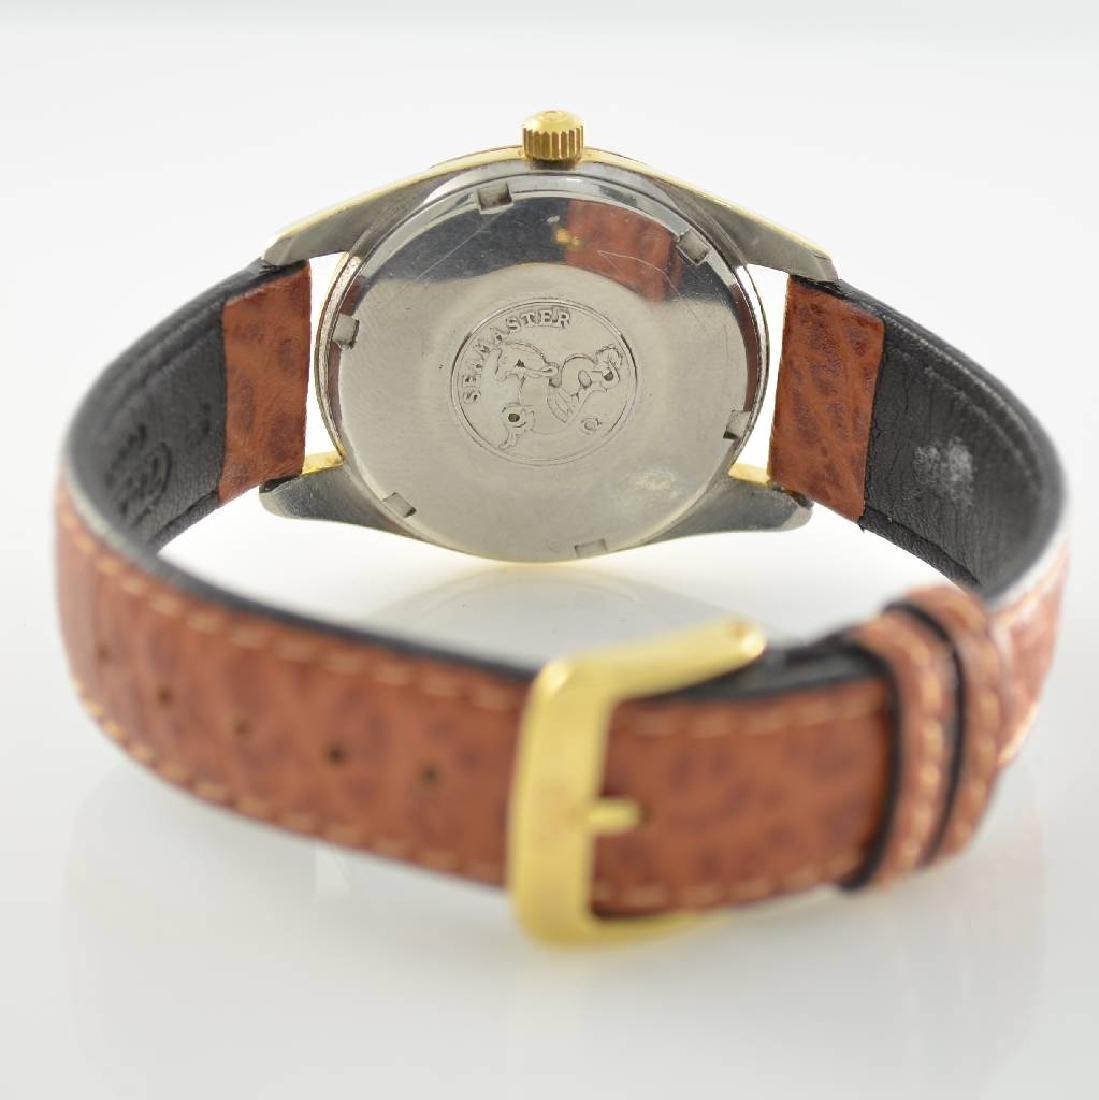 OMEGA self winding gents wristwatch model Seamaster - 4